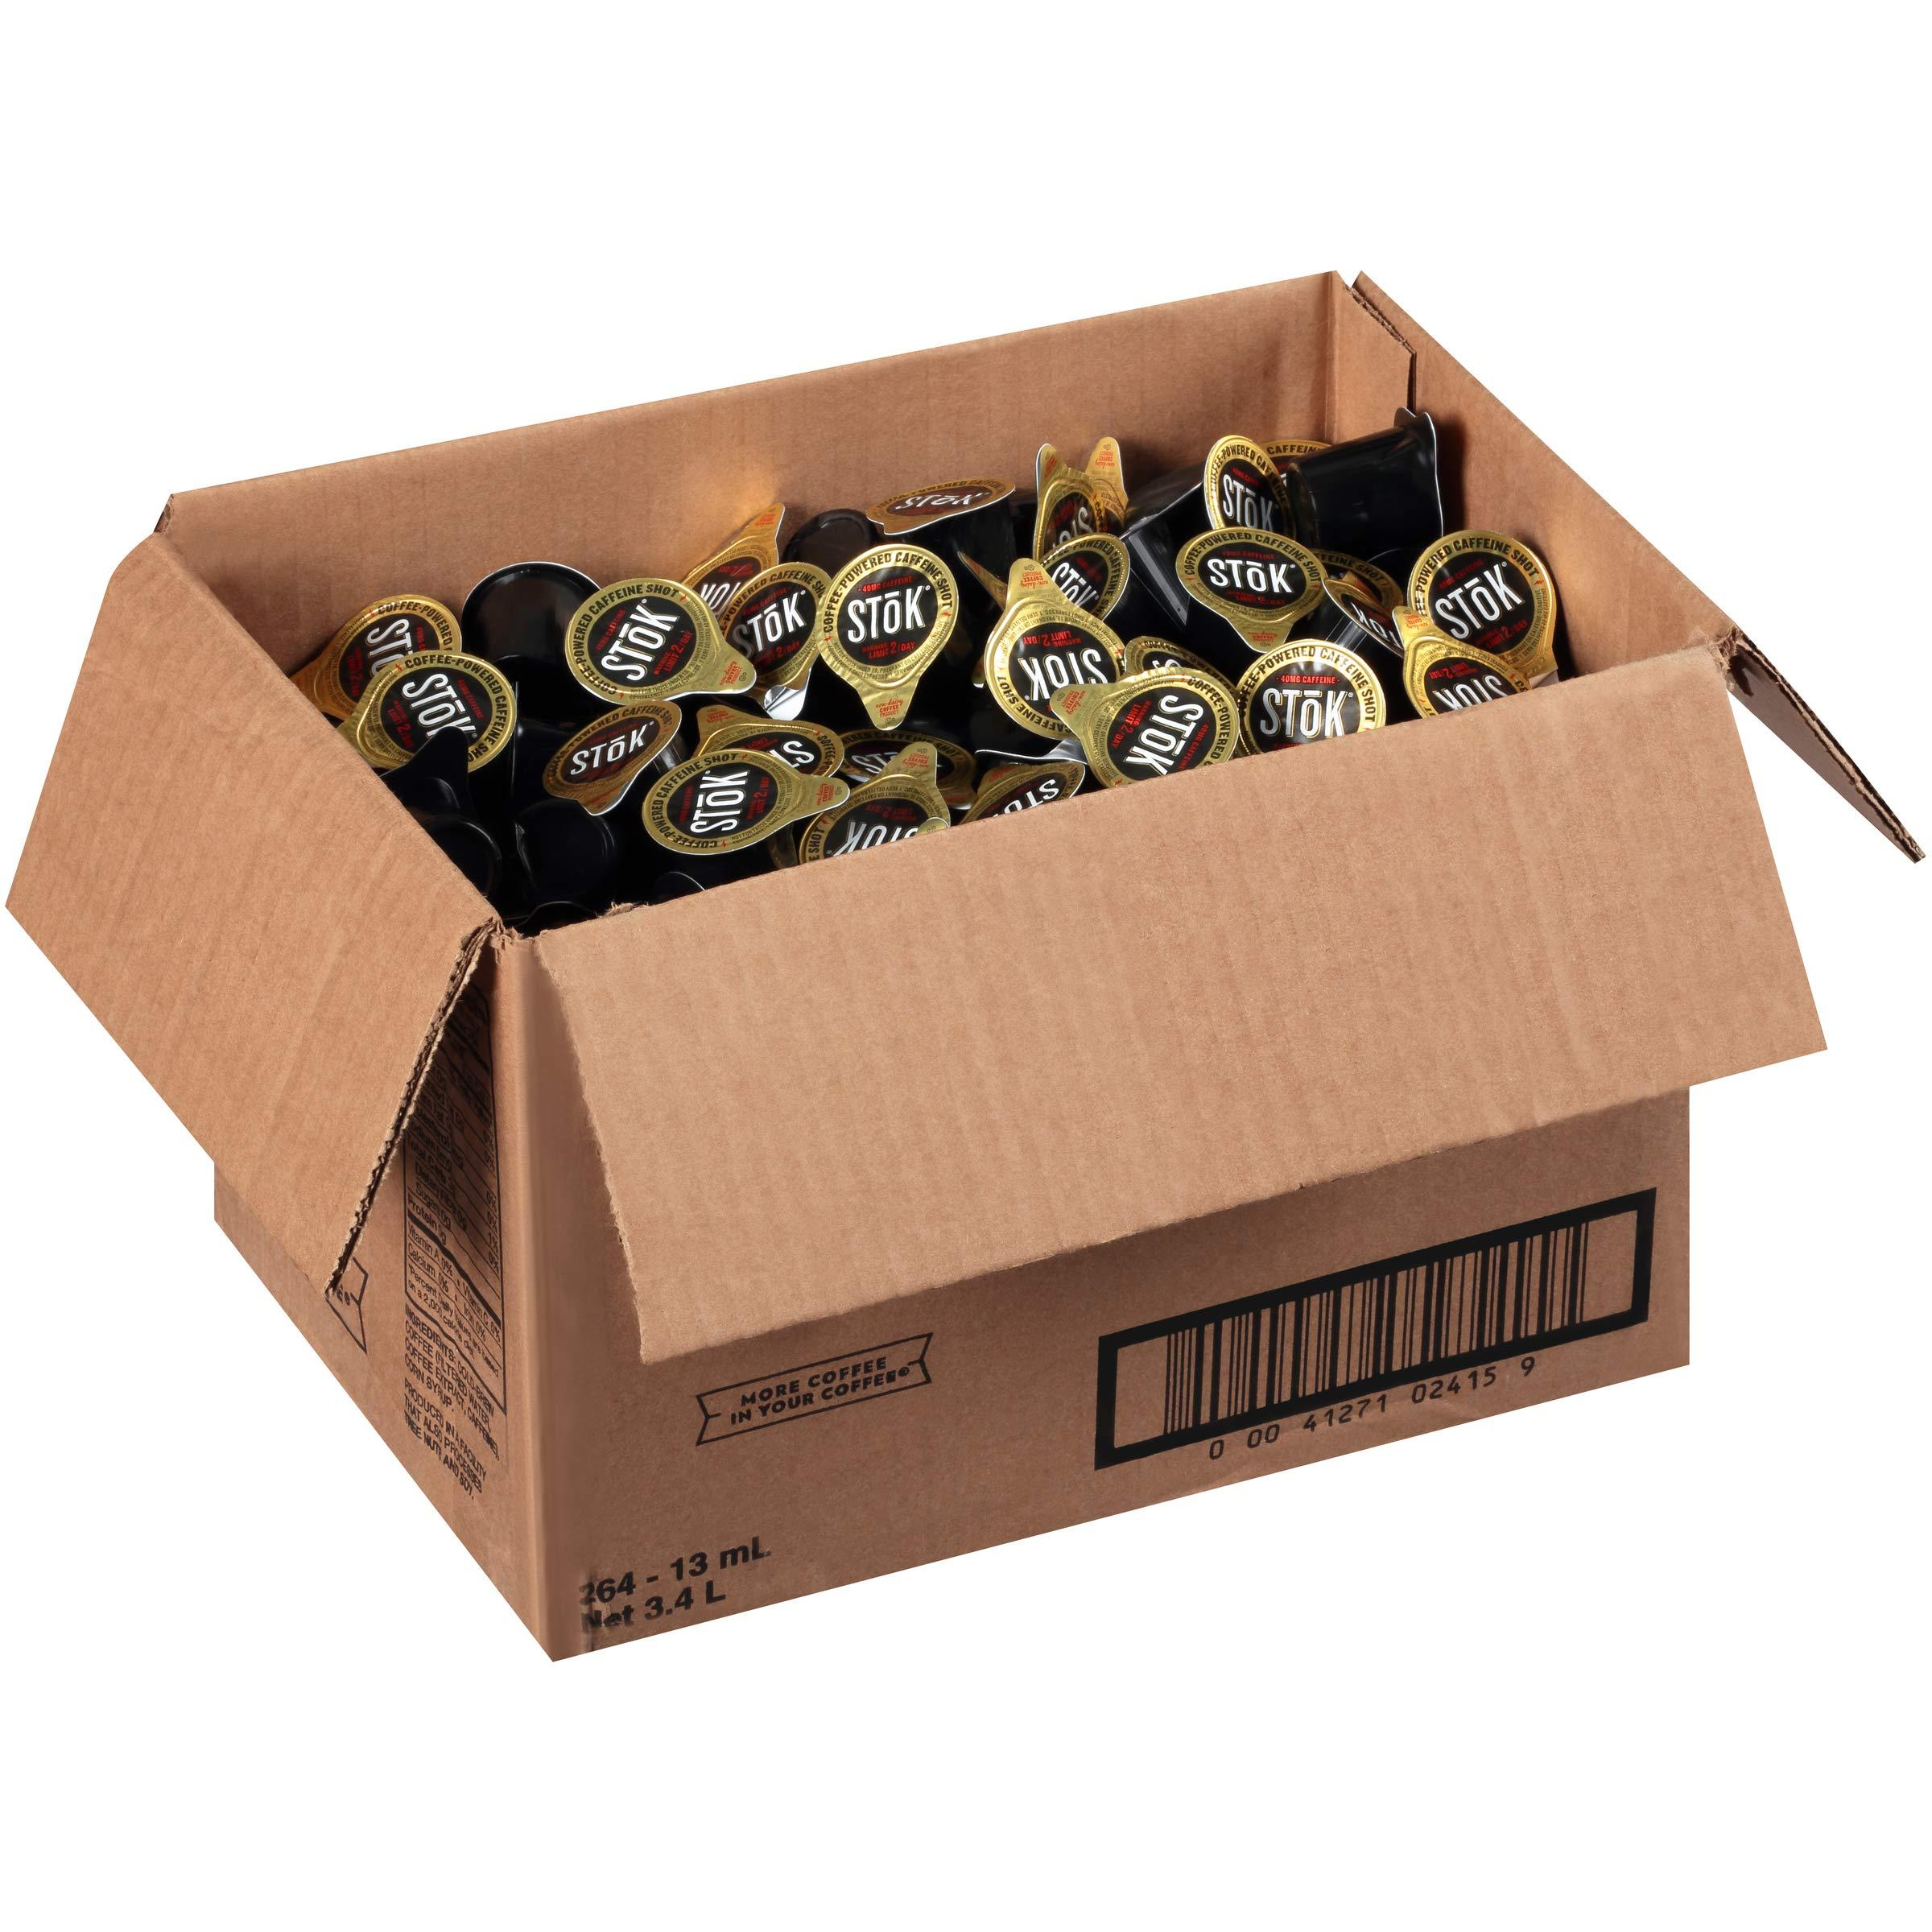 SToK Caffeinated Black Coffee Shots, 264 Single-Serving Shots, Single-Serve S... 41271024159 | eBay